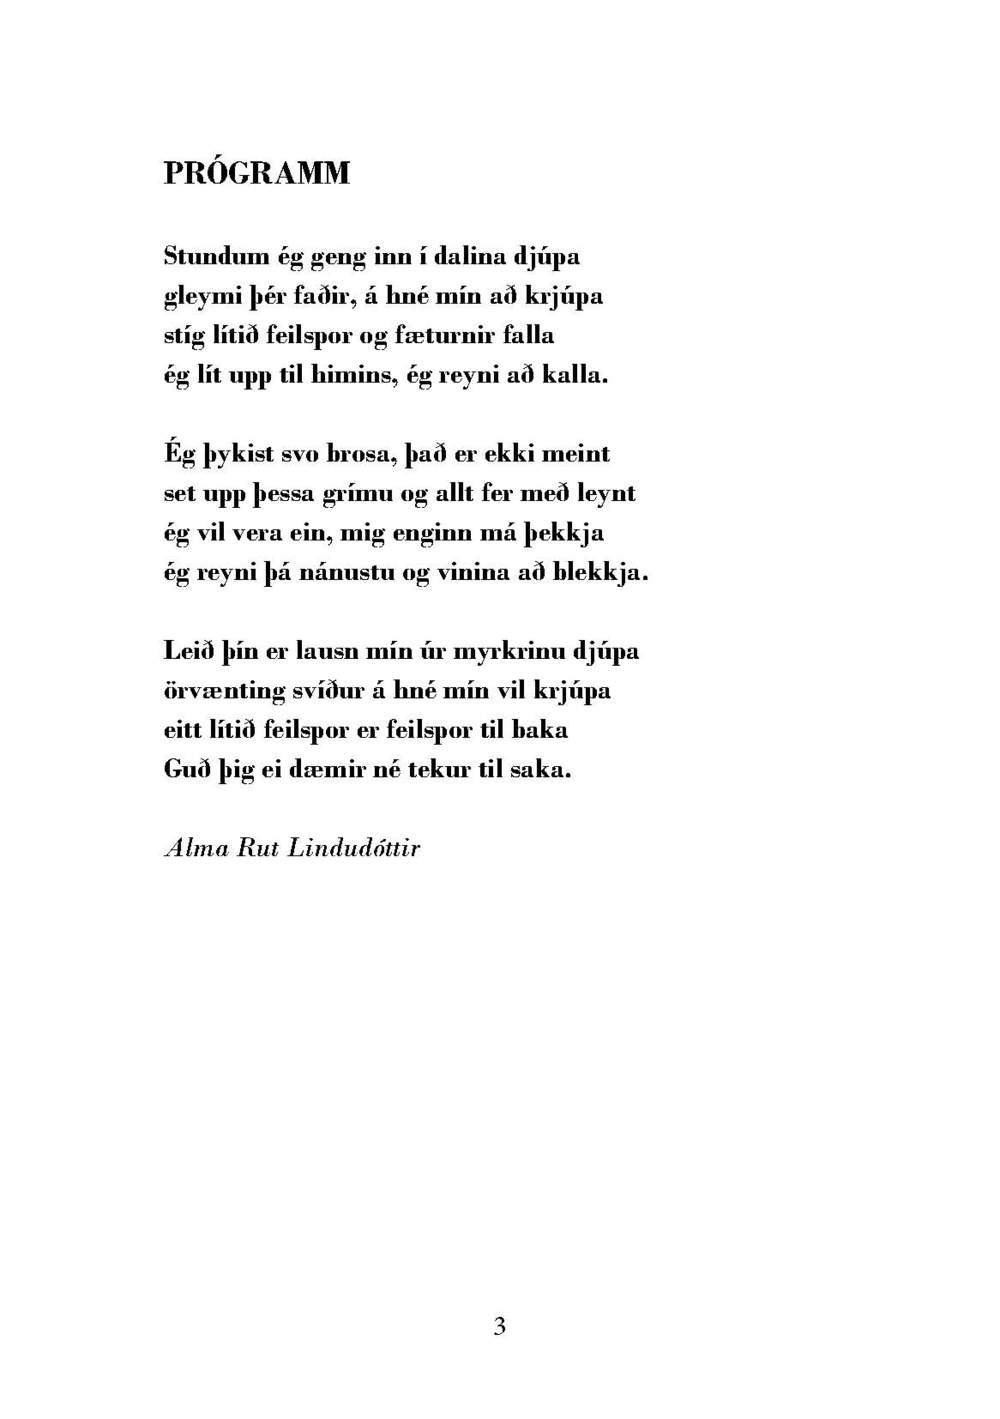 27073-ljodabokin--oll_Page_13.jpg